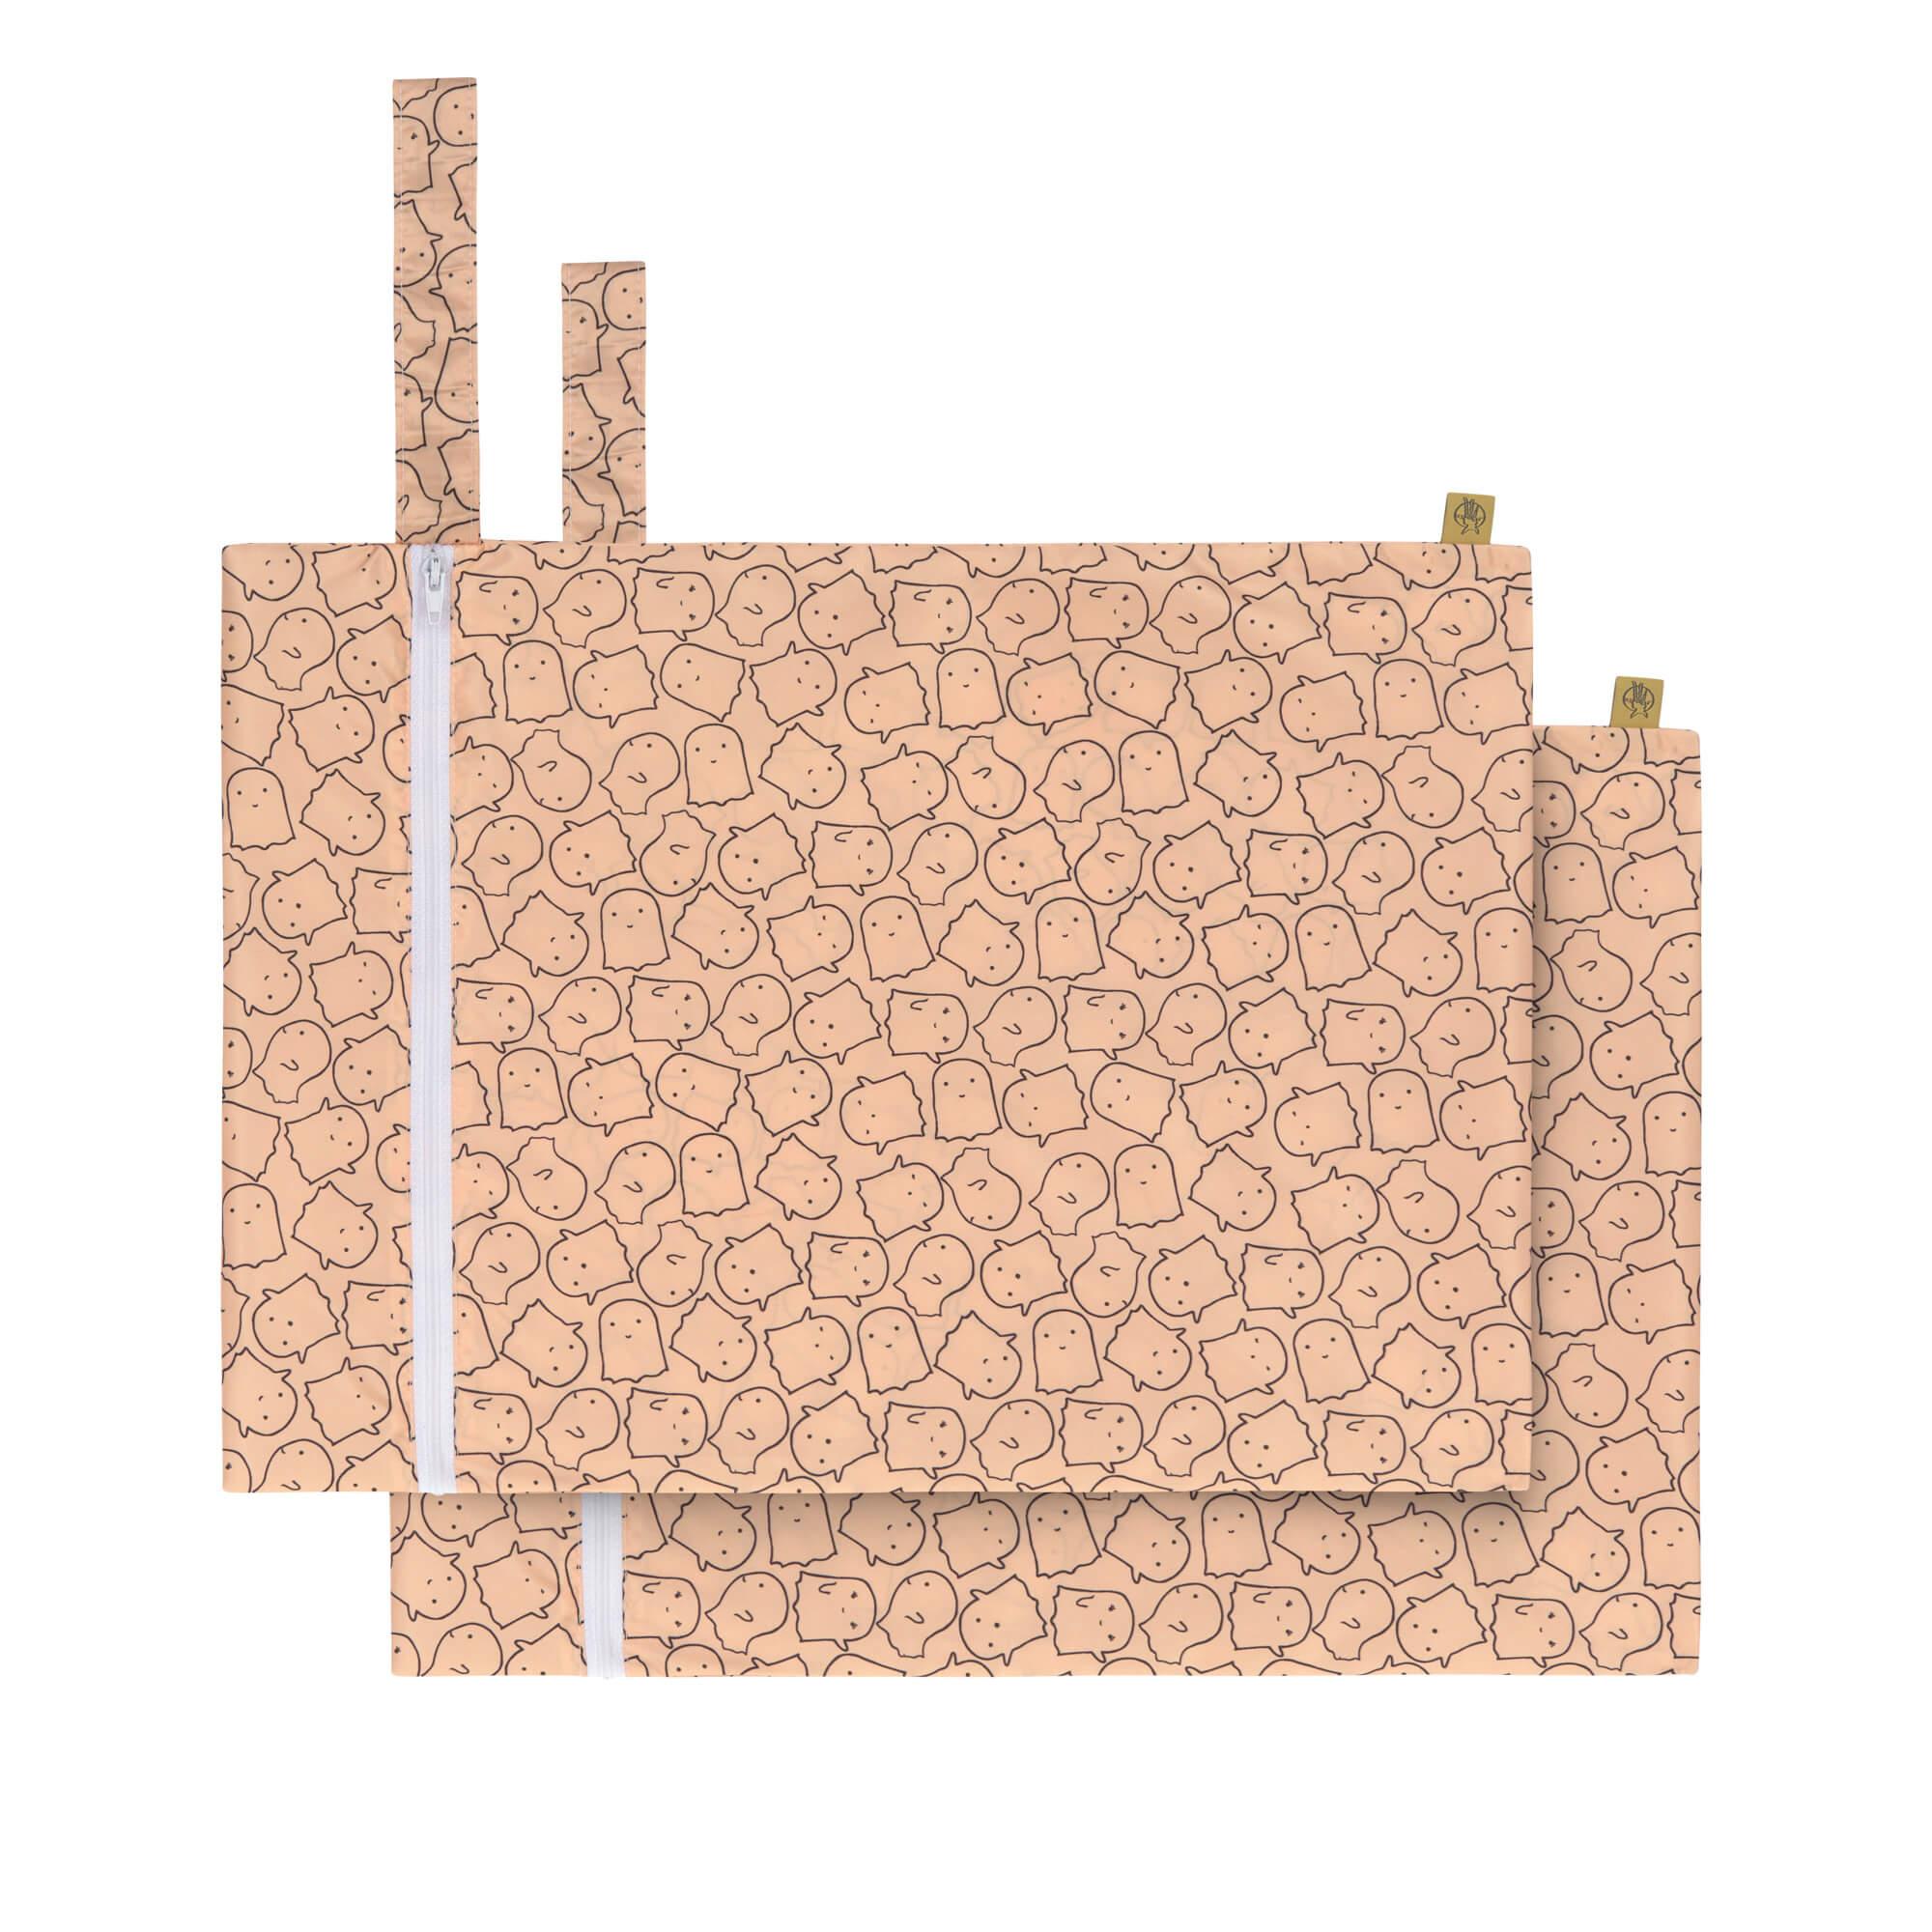 Nasstasche / Wet Bag (2 Stk) - Little Spookies Peach - Lässig